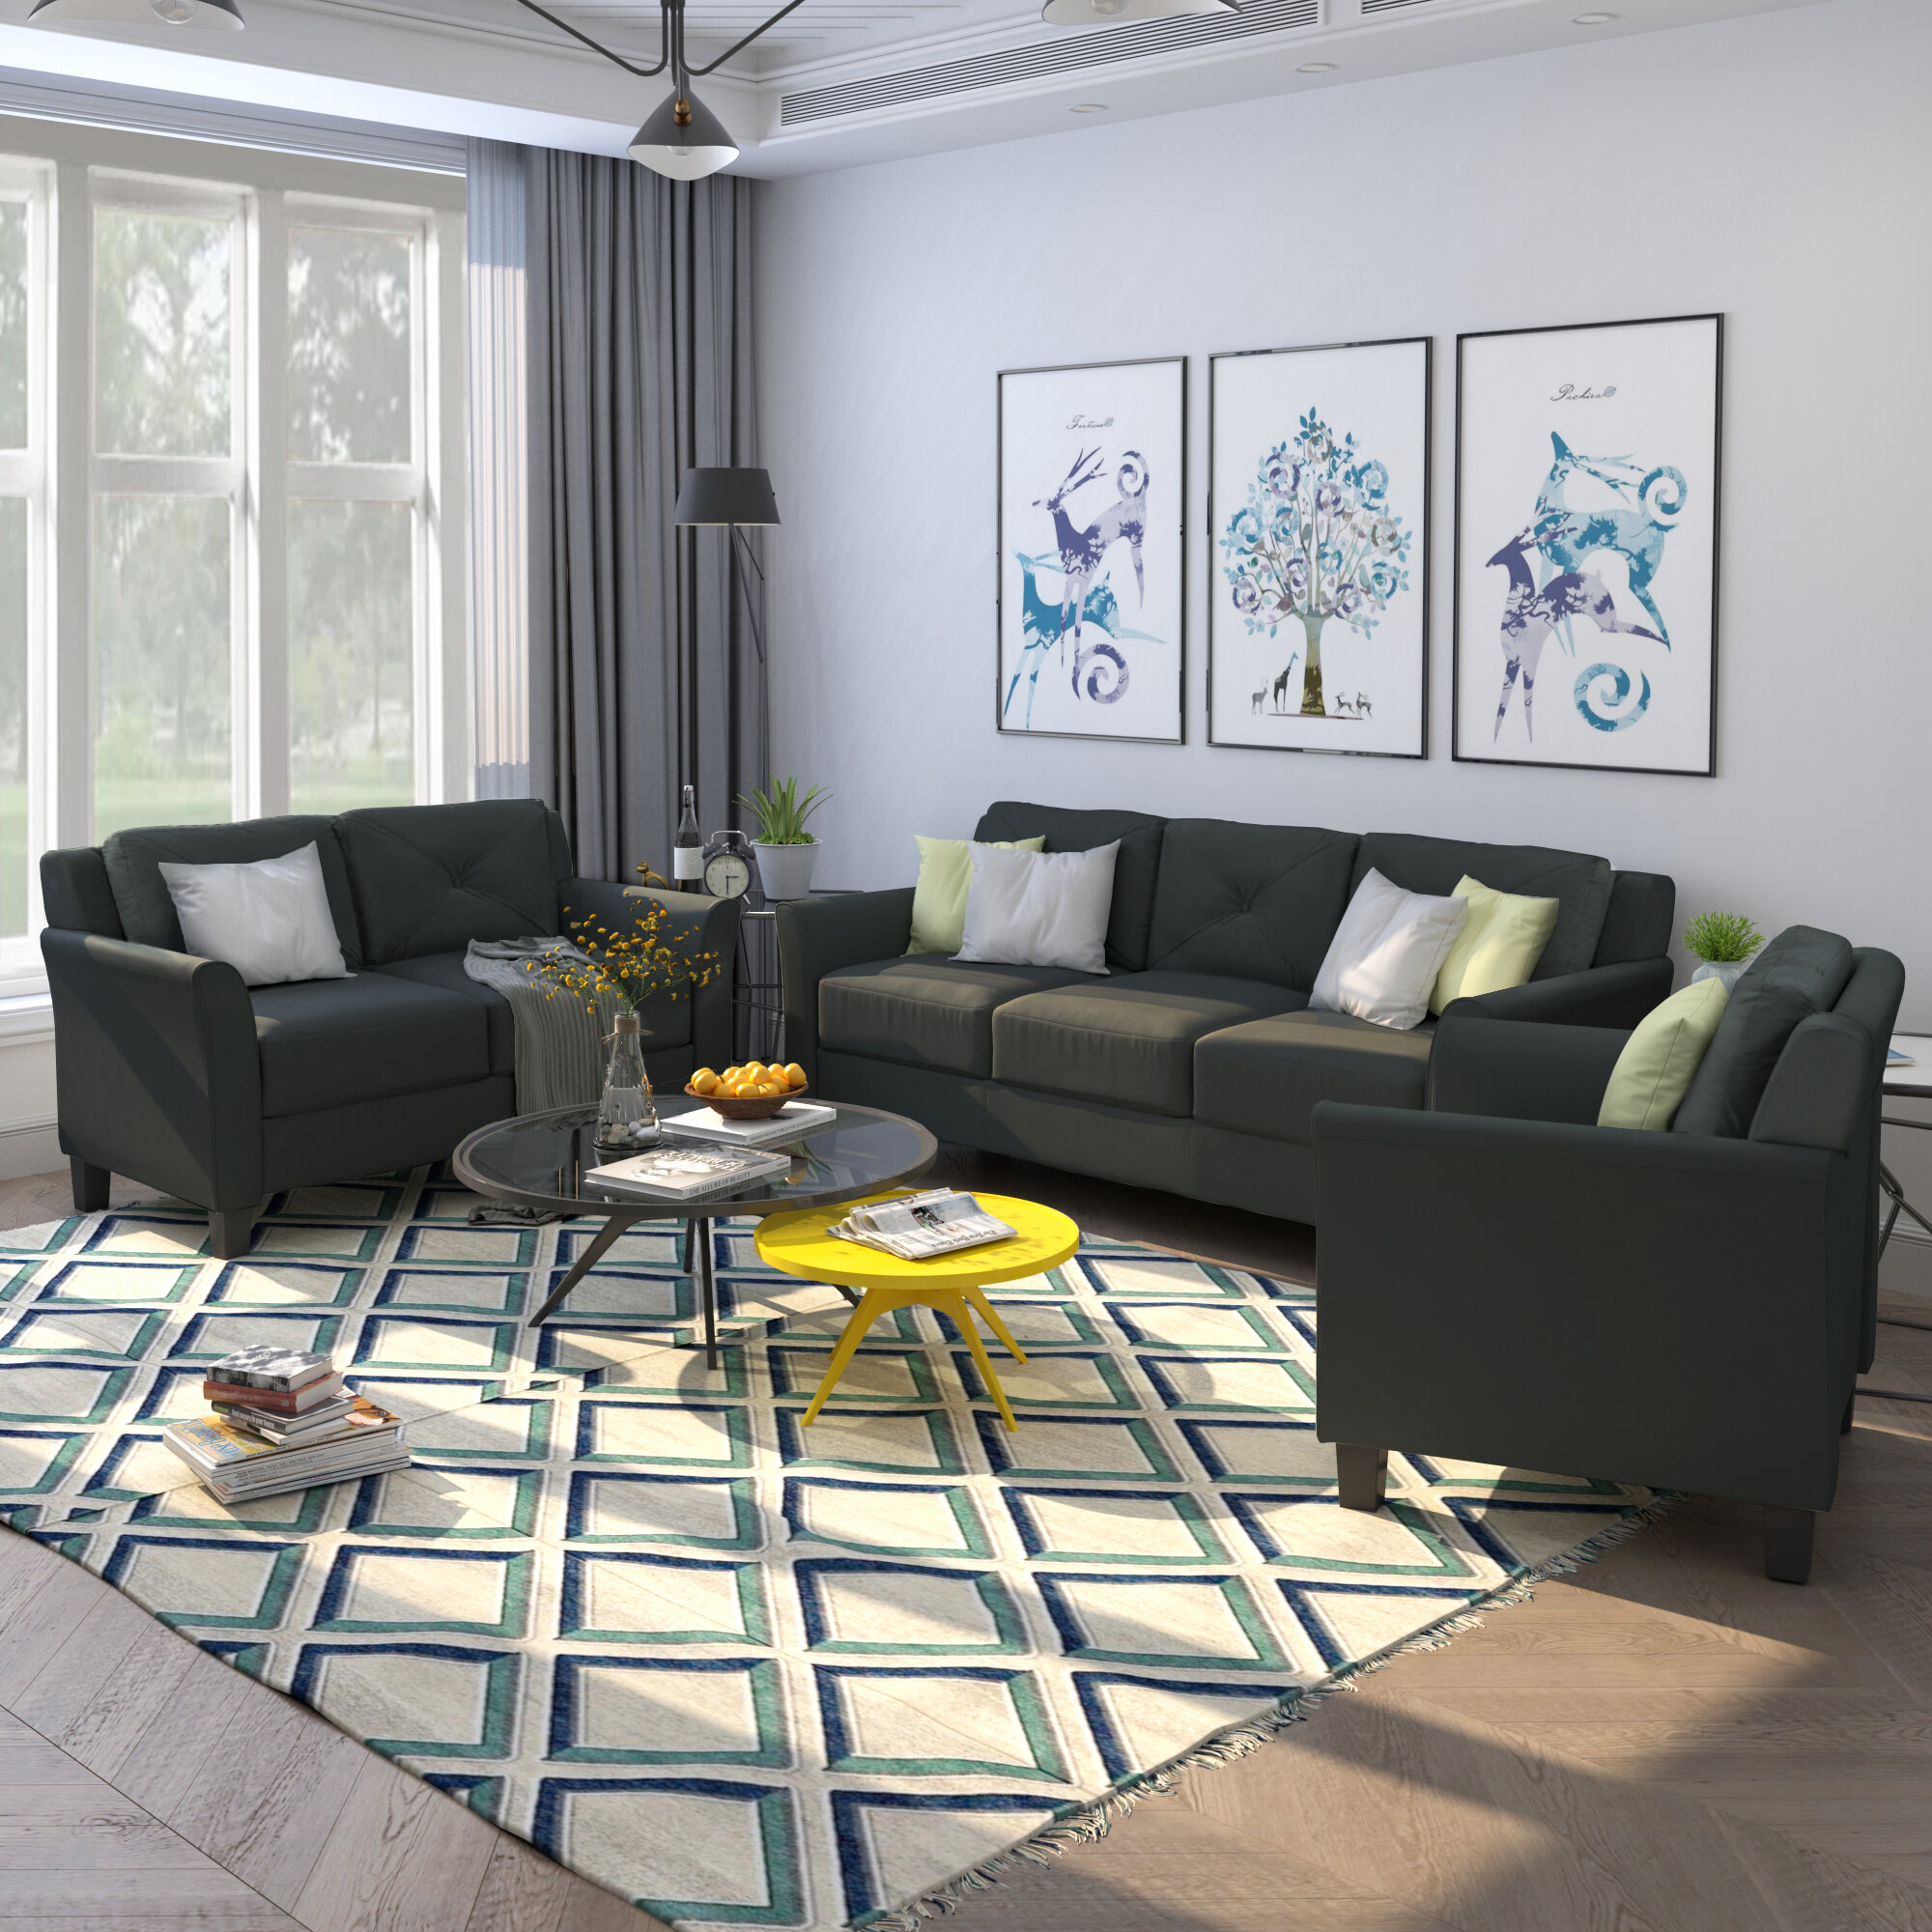 big sale bestselling living room sets you'll love in